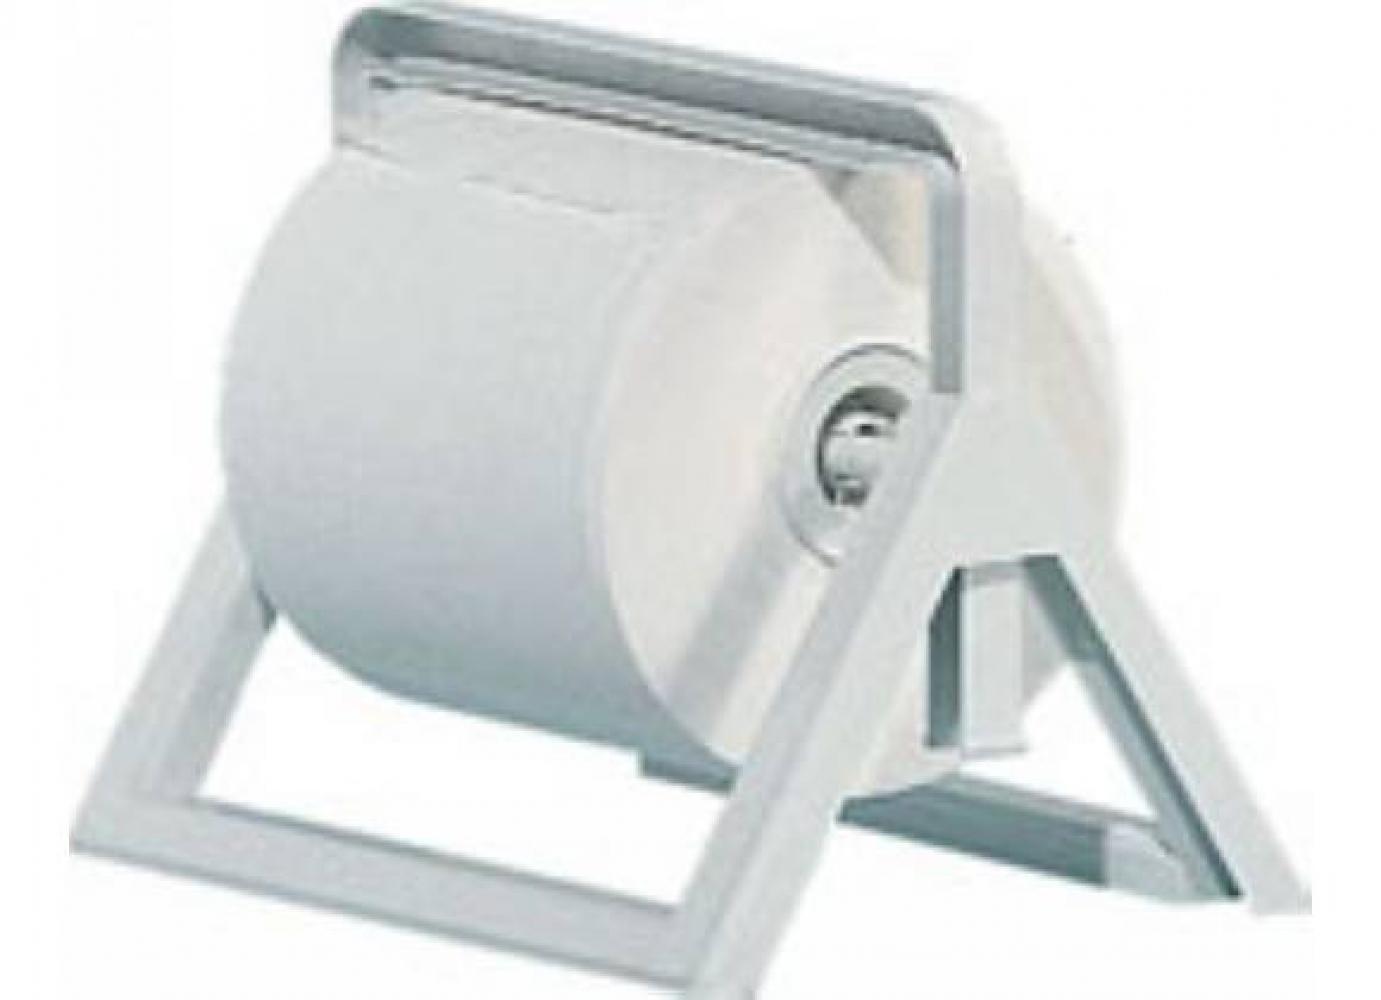 Acquista Portabobina Bianco Da Muro Aperto 17545675 | Glooke.com